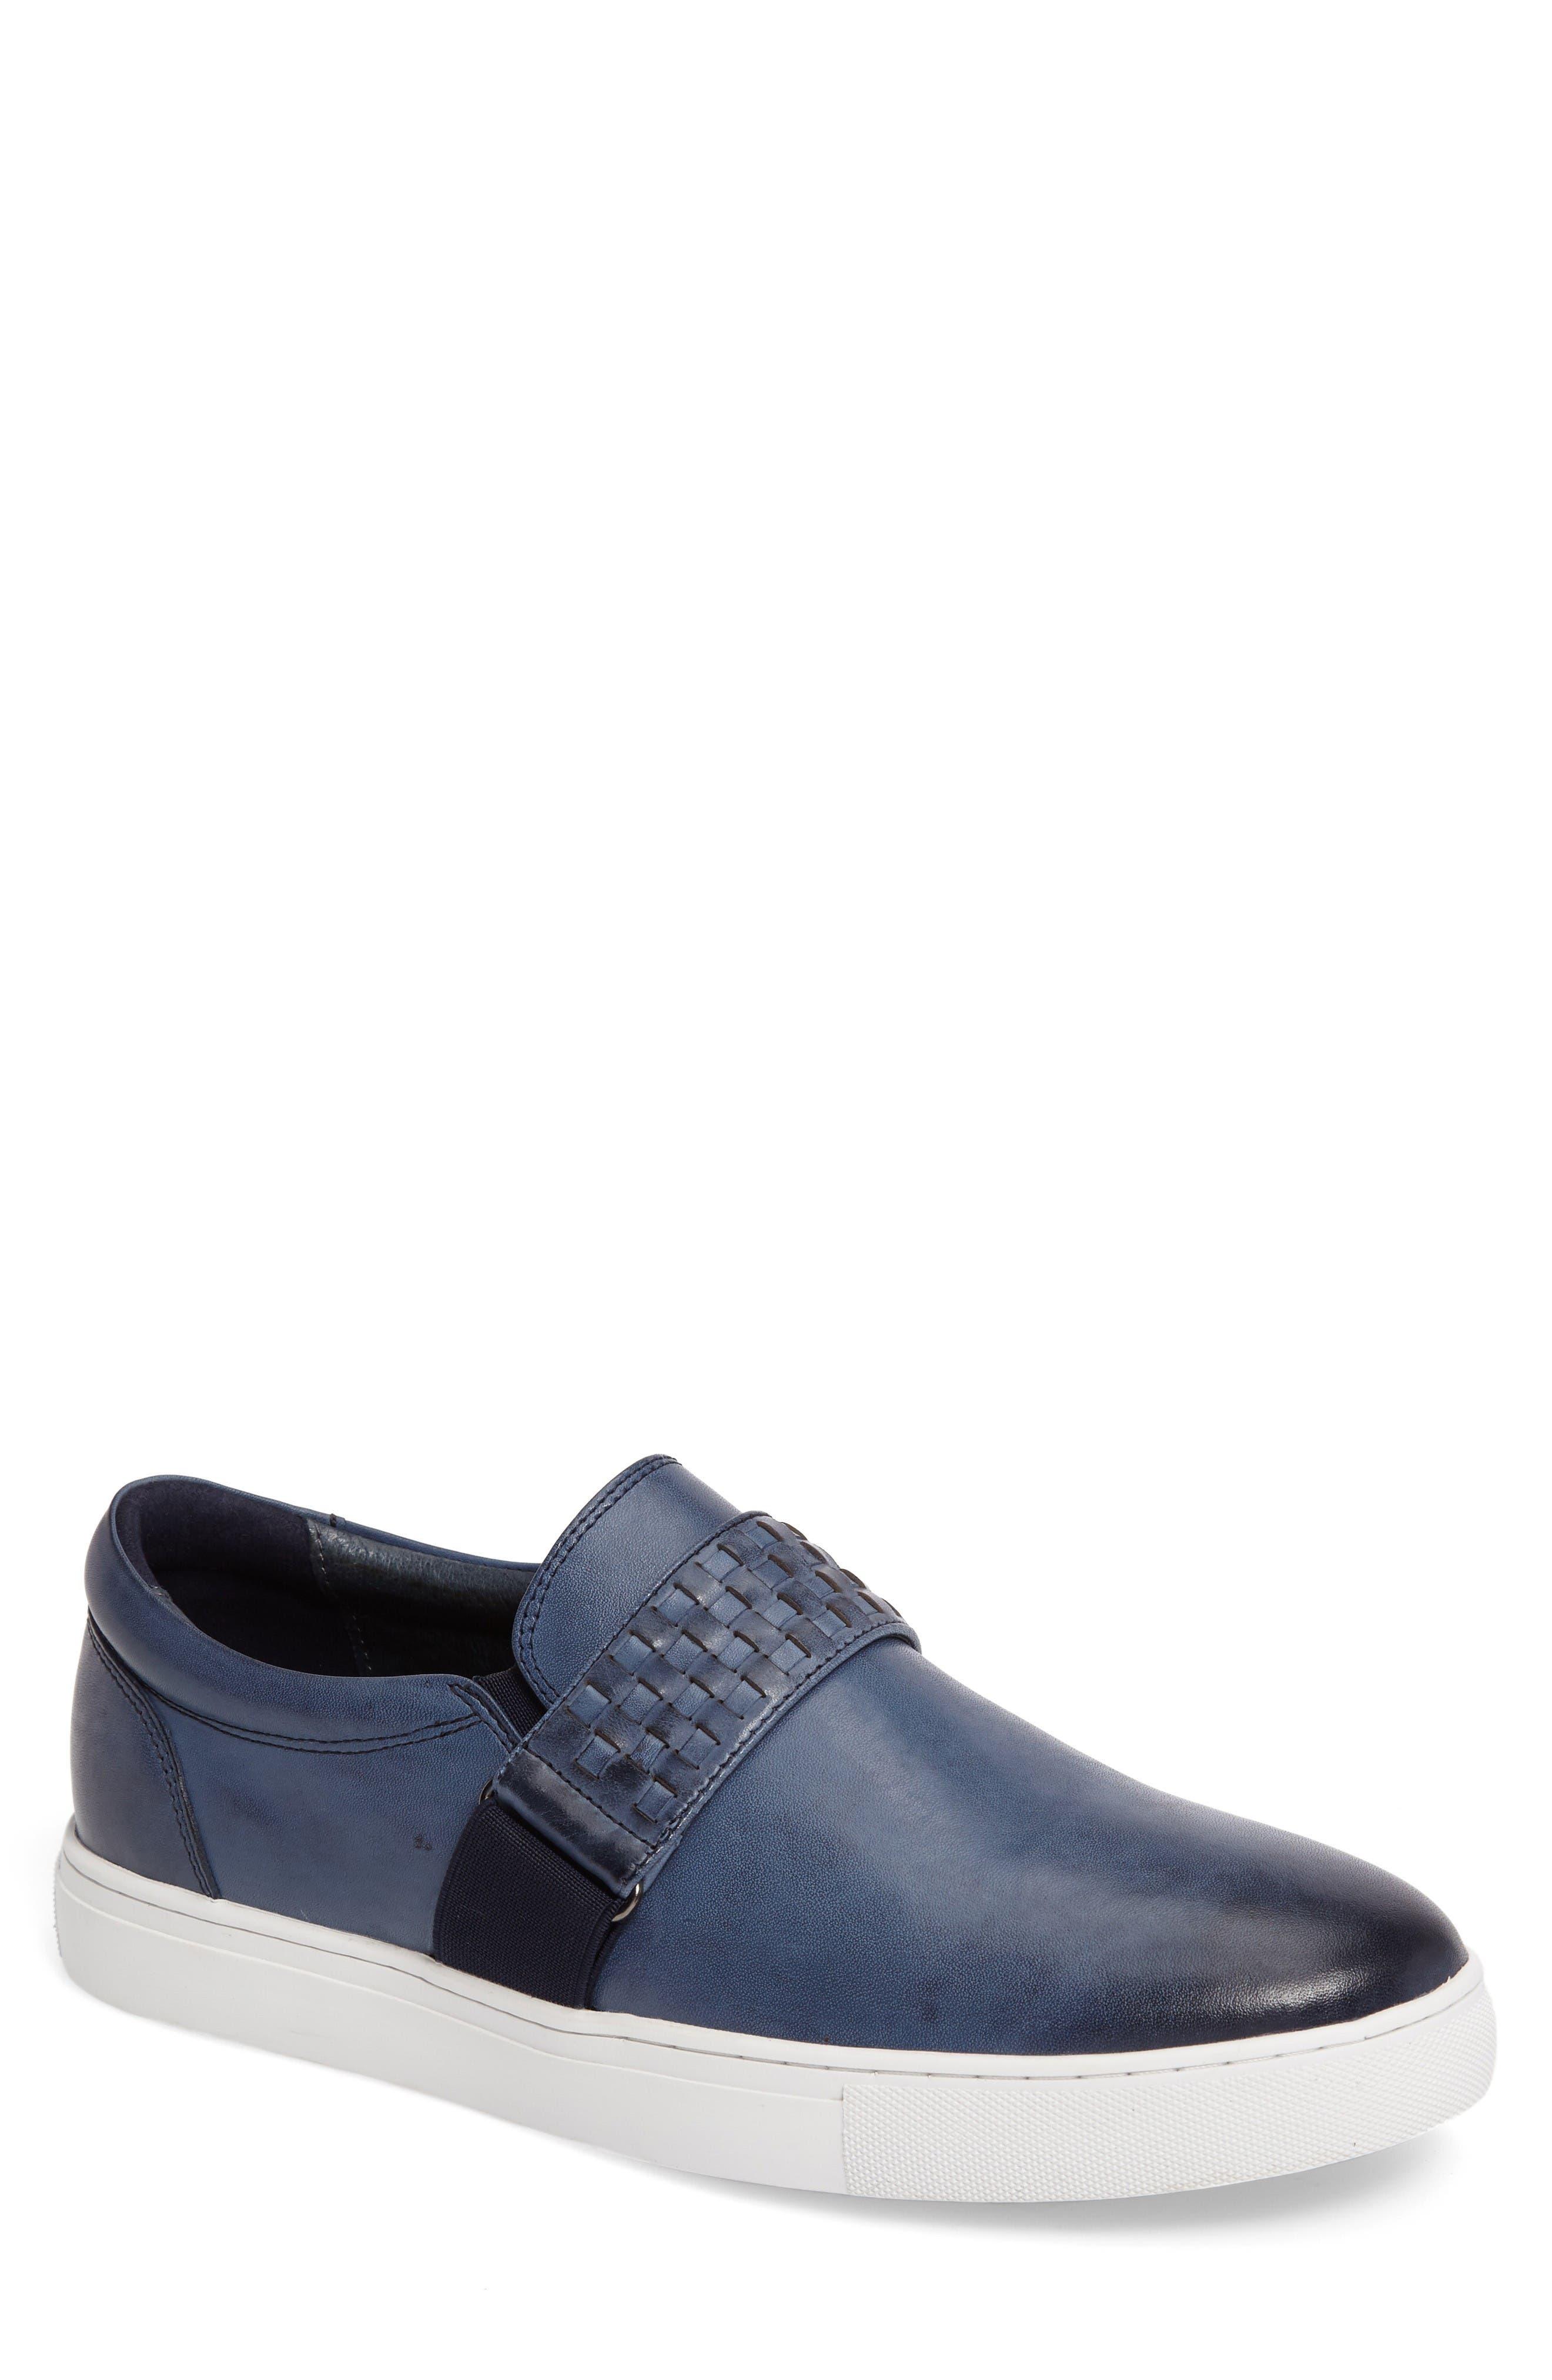 Van Gogh Slip-On Sneaker,                         Main,                         color, Navy Leather